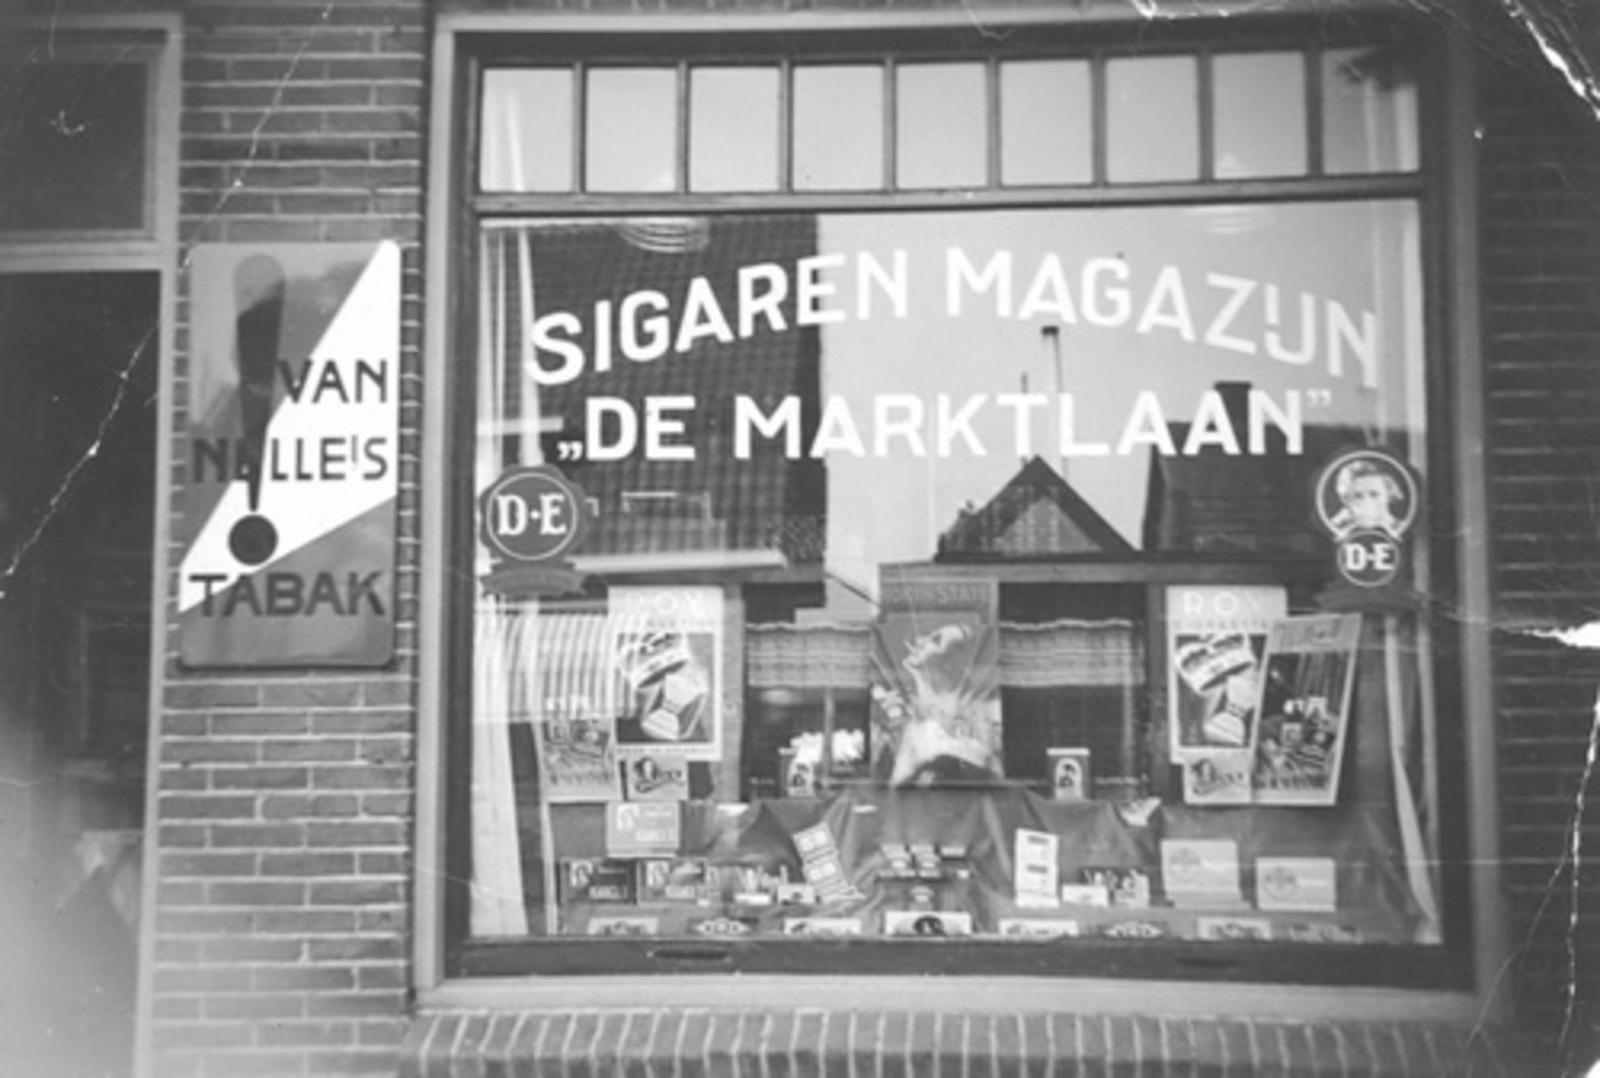 Marktlaan O 0022 1939 Etalage